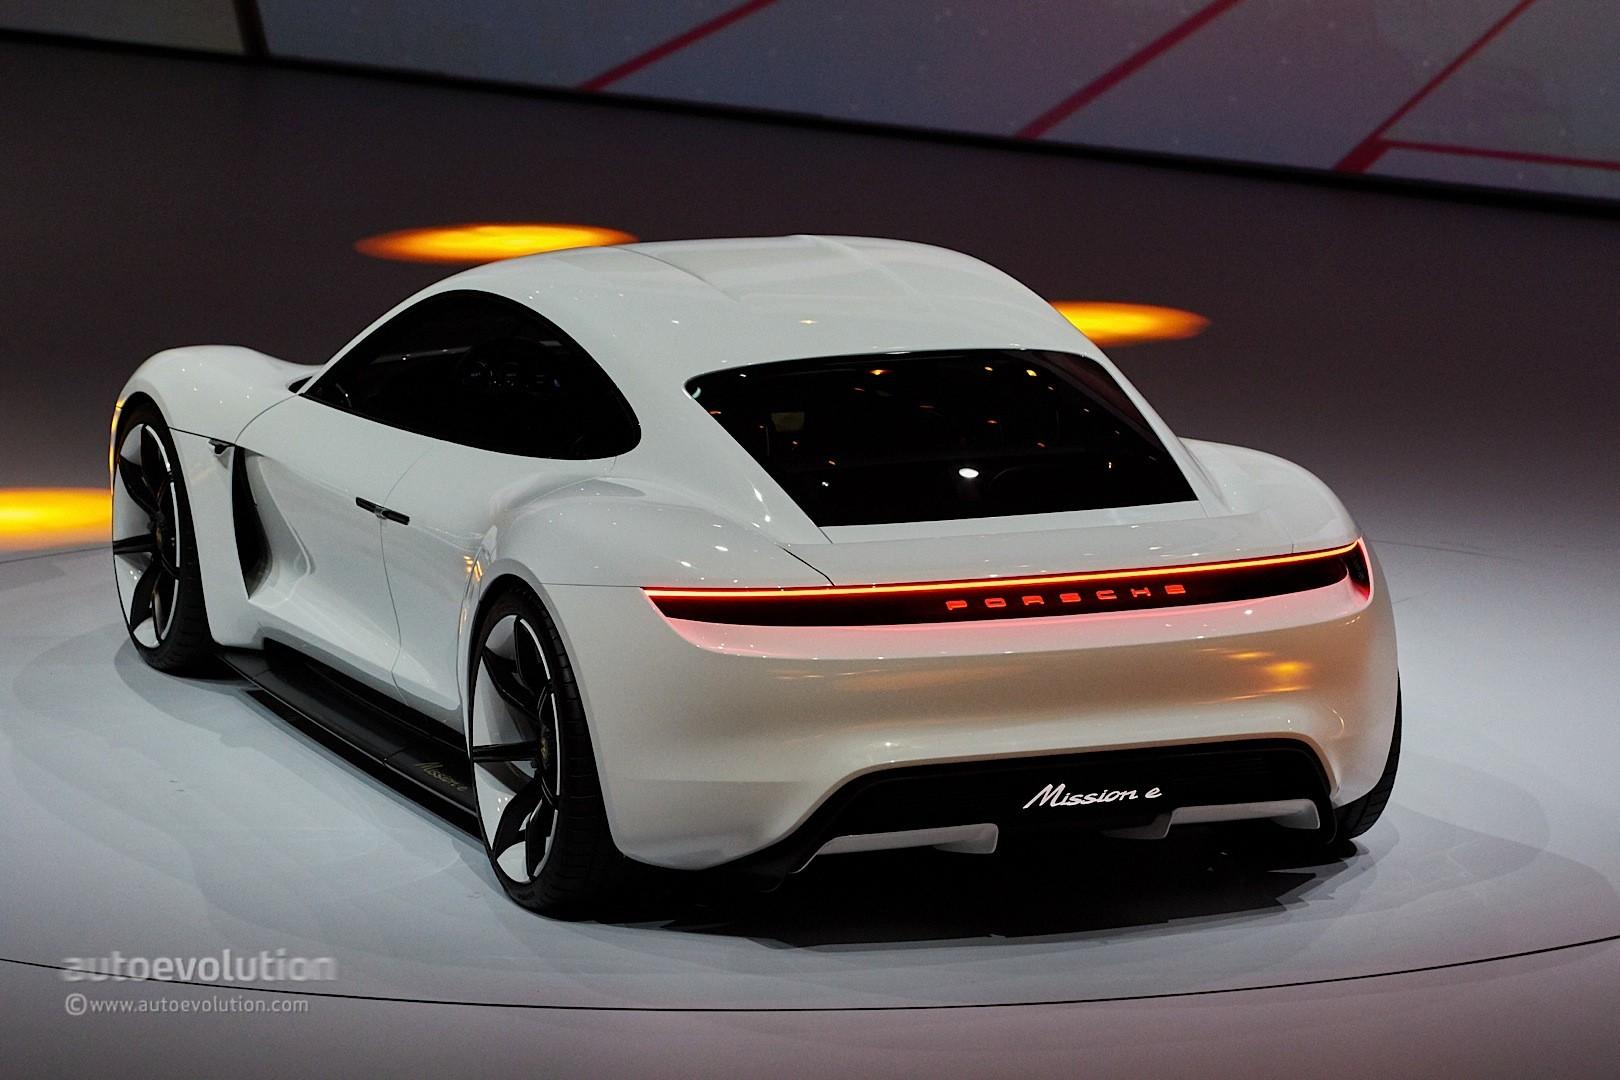 2020 Porsche Taycan Price Info Turbo To Cost \u201cOver $130,000